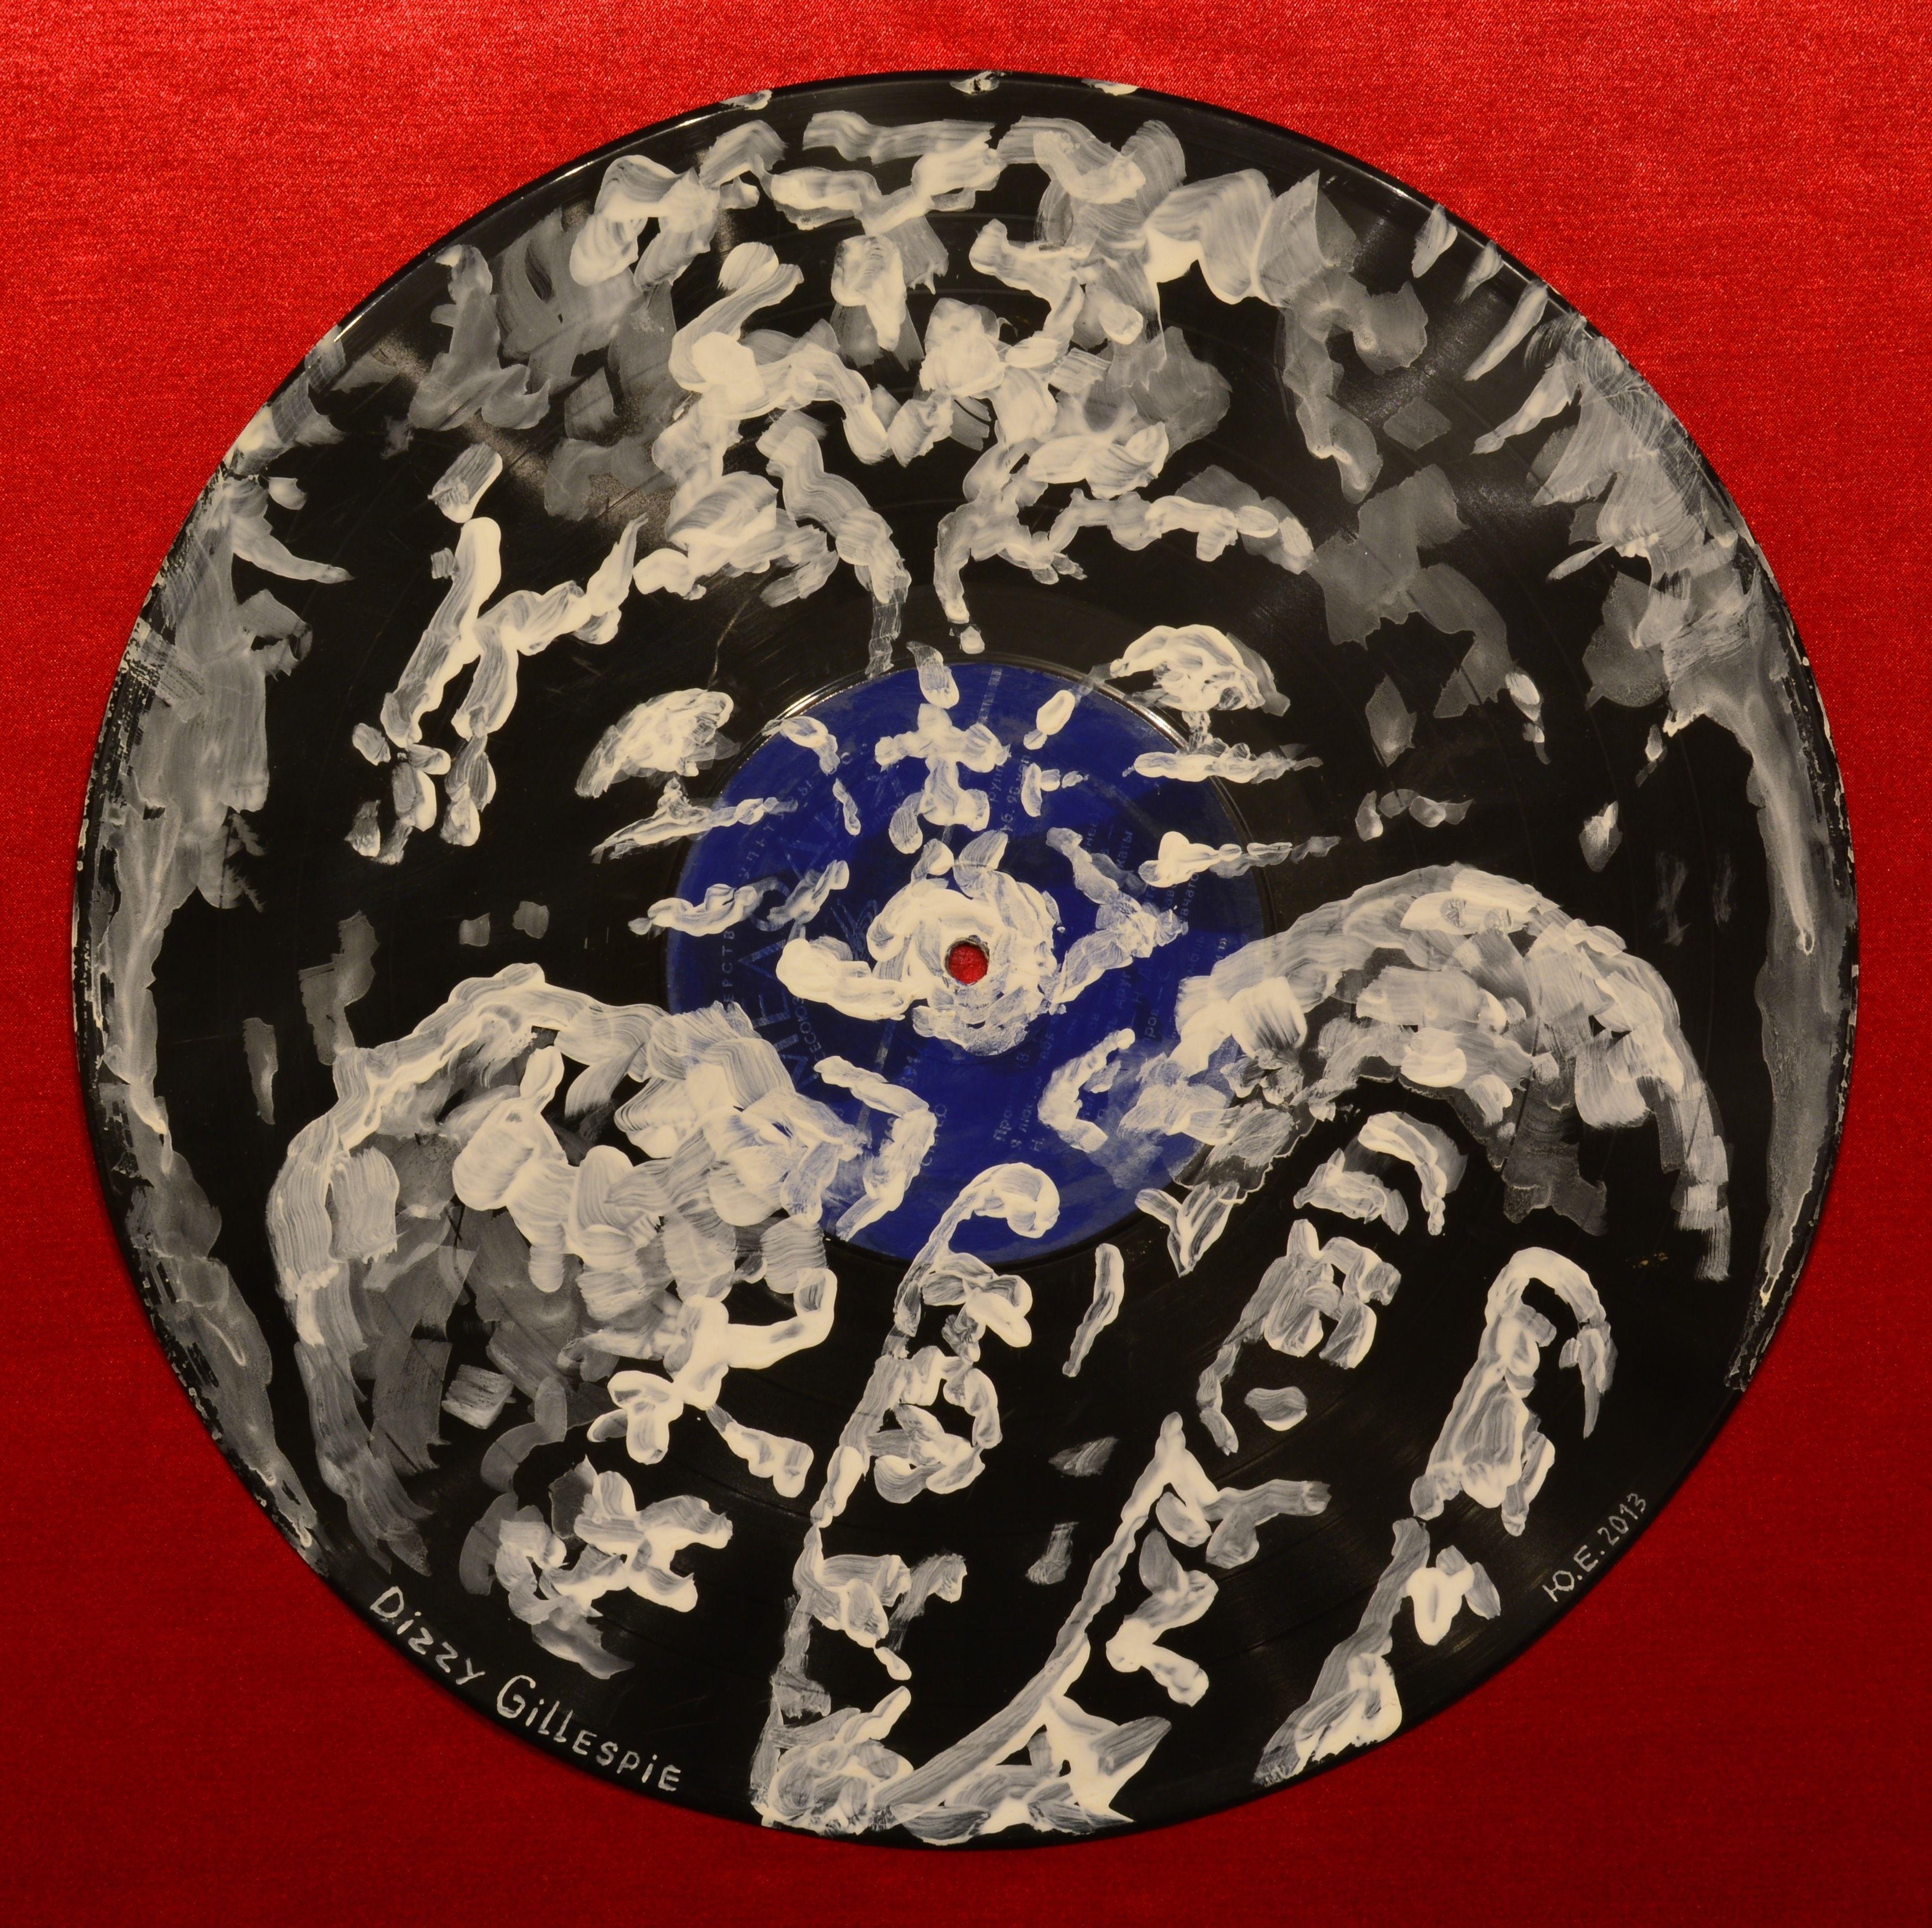 Yury Ermolenko, ''Dizzy Gillespie'' - Facevinyl - THE BIG COLLECTION - №8, side I, 2013, acrylic on vinyl. The History of Jazz and Blues. #YuryErmolenko #еrmolenko #ЮрийЕрмоленко #ермоленко #yuryermolenko #юрийермоленко #юрийермоленкохудожник #юрiйєрмоленко #ЮрiйЄрмоленко #єрмоленко #rapanstudio #modernart #fineart #contemporaryart #painting #art #vinyl #texture #portrait #music #jazzmusic #bluesmusic #Facevinyl #jazz #blues #RapanStudio #artproject #портрет #музыкант #musician…